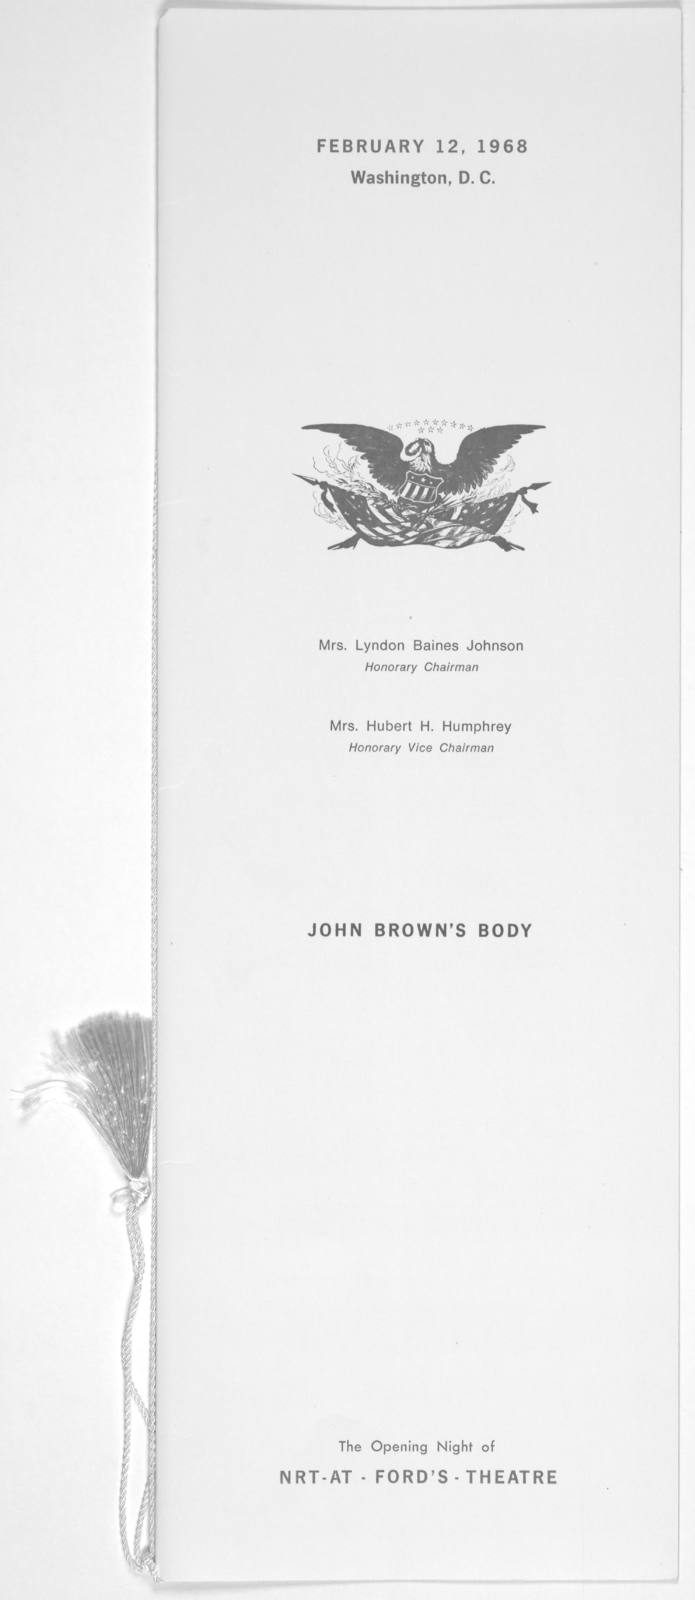 ... Ford's Threatre Society presents ... Stephen Vincent Benet's Civil War saga ... John Brown's body. [Wash.] NRT-at-Ford's Theatre, 1968.